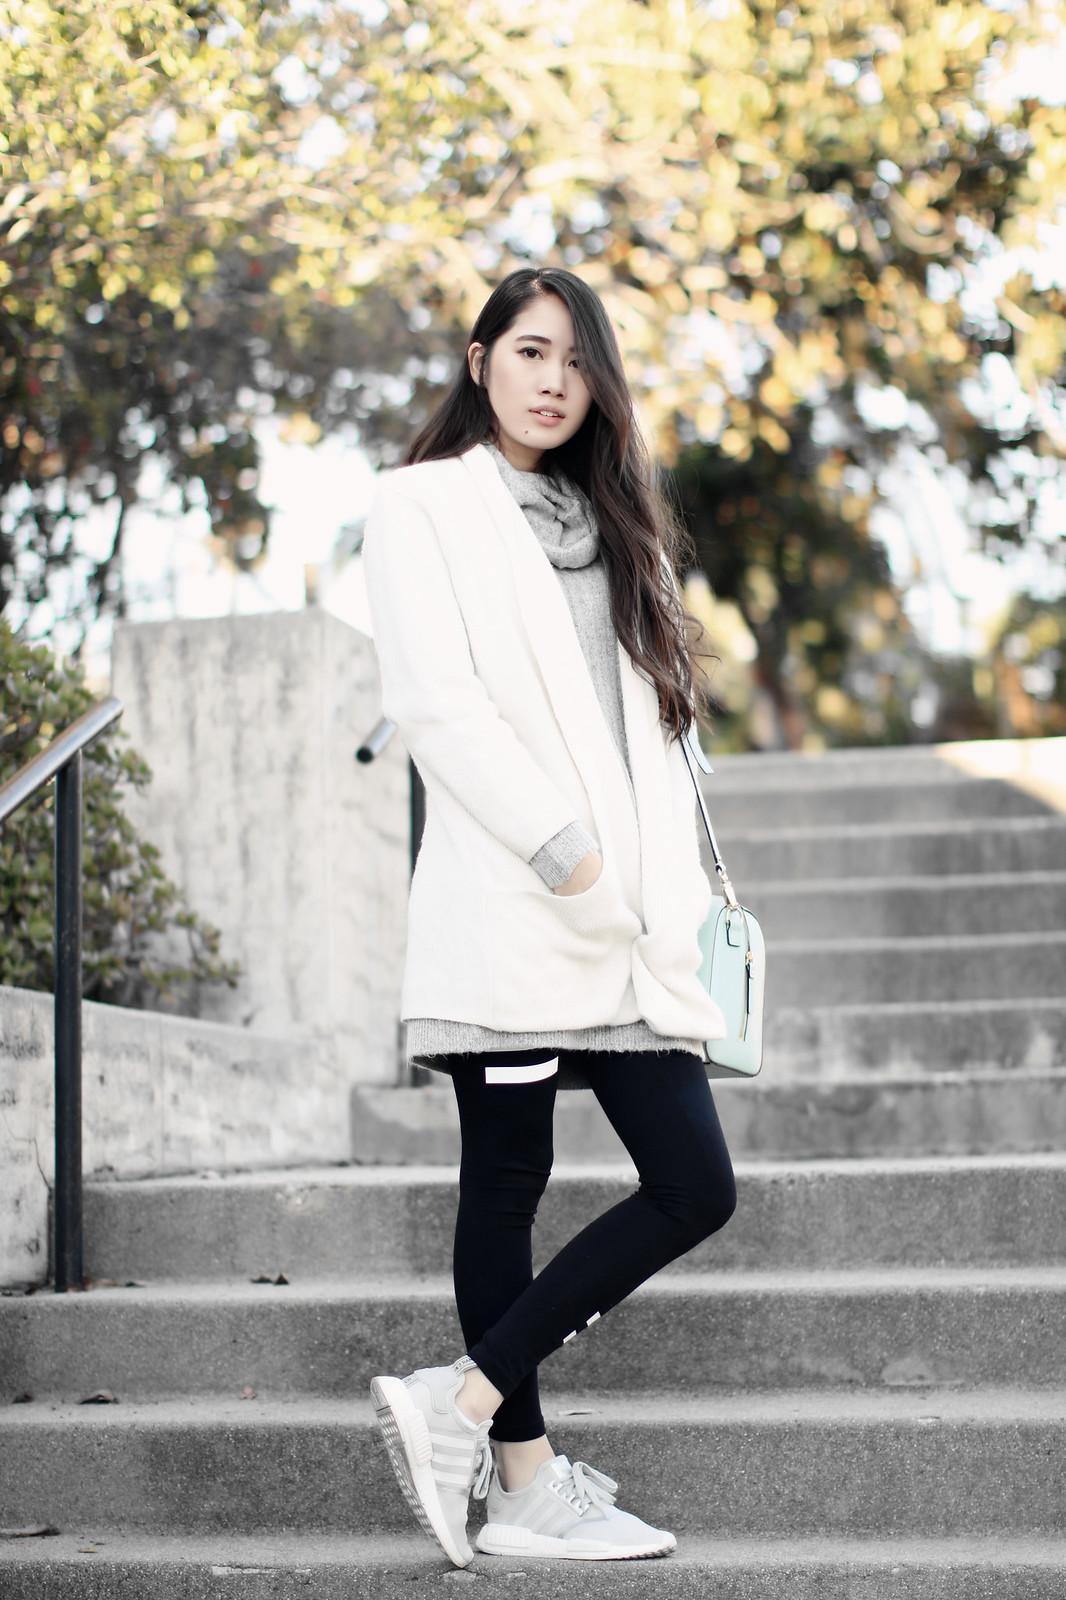 1534-ootd-fashion-style-tobi-cowl-neck-turtleneck-sweater-dress-asianfashion-koreanfashion-winterfashion-clothestoyouuu-elizabeeetht